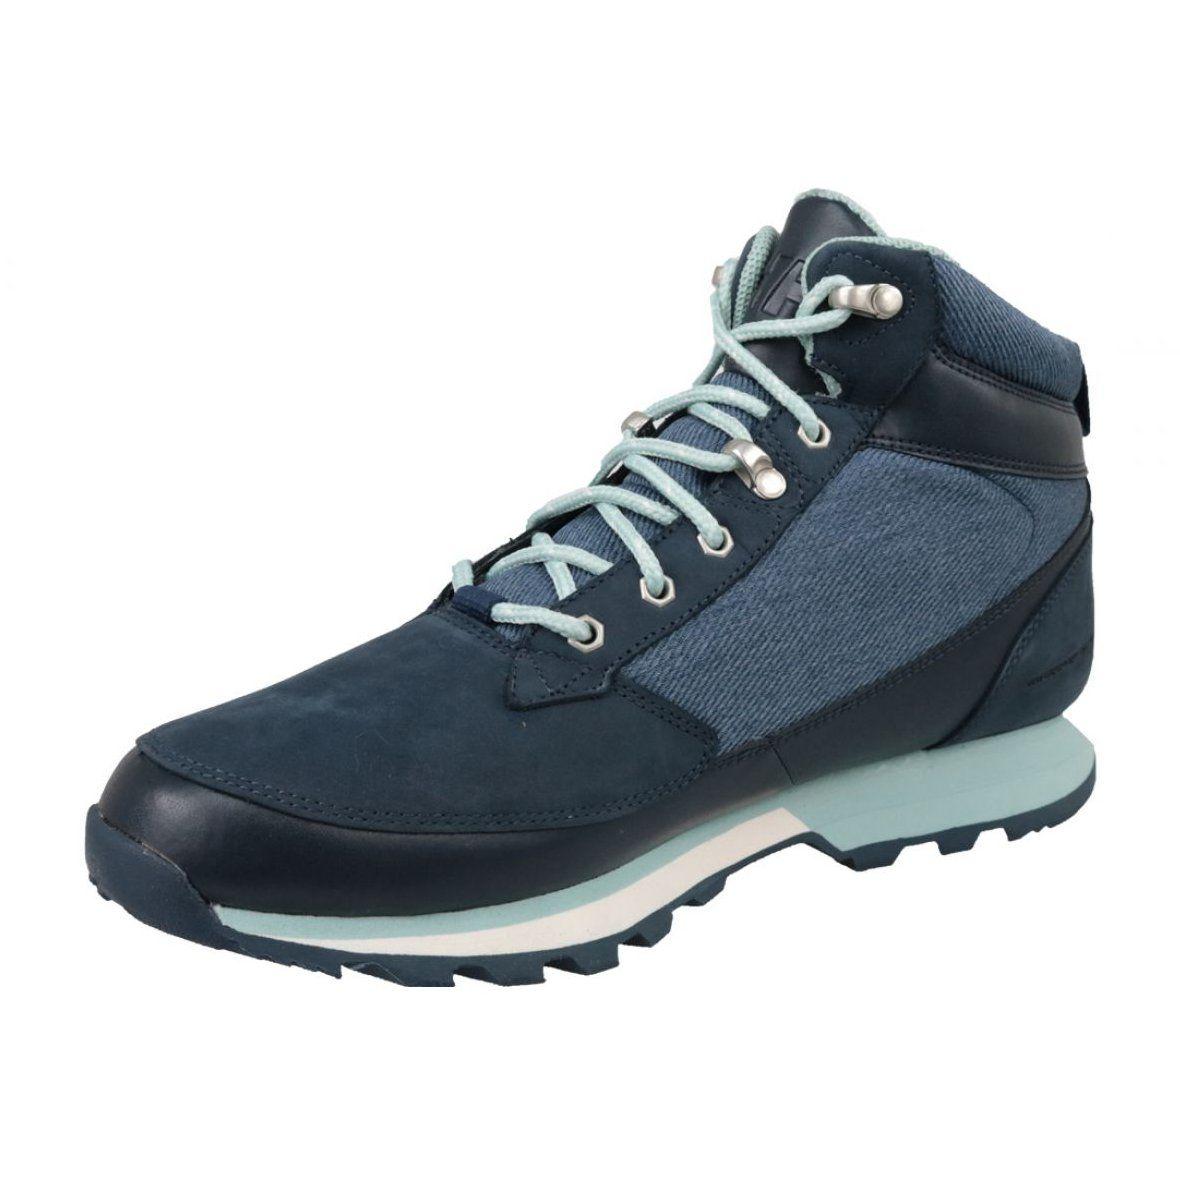 Buty Helly Hansen Chilcotin W 11428 689 Granatowe Helly Hansen Shoes Sport Shoes